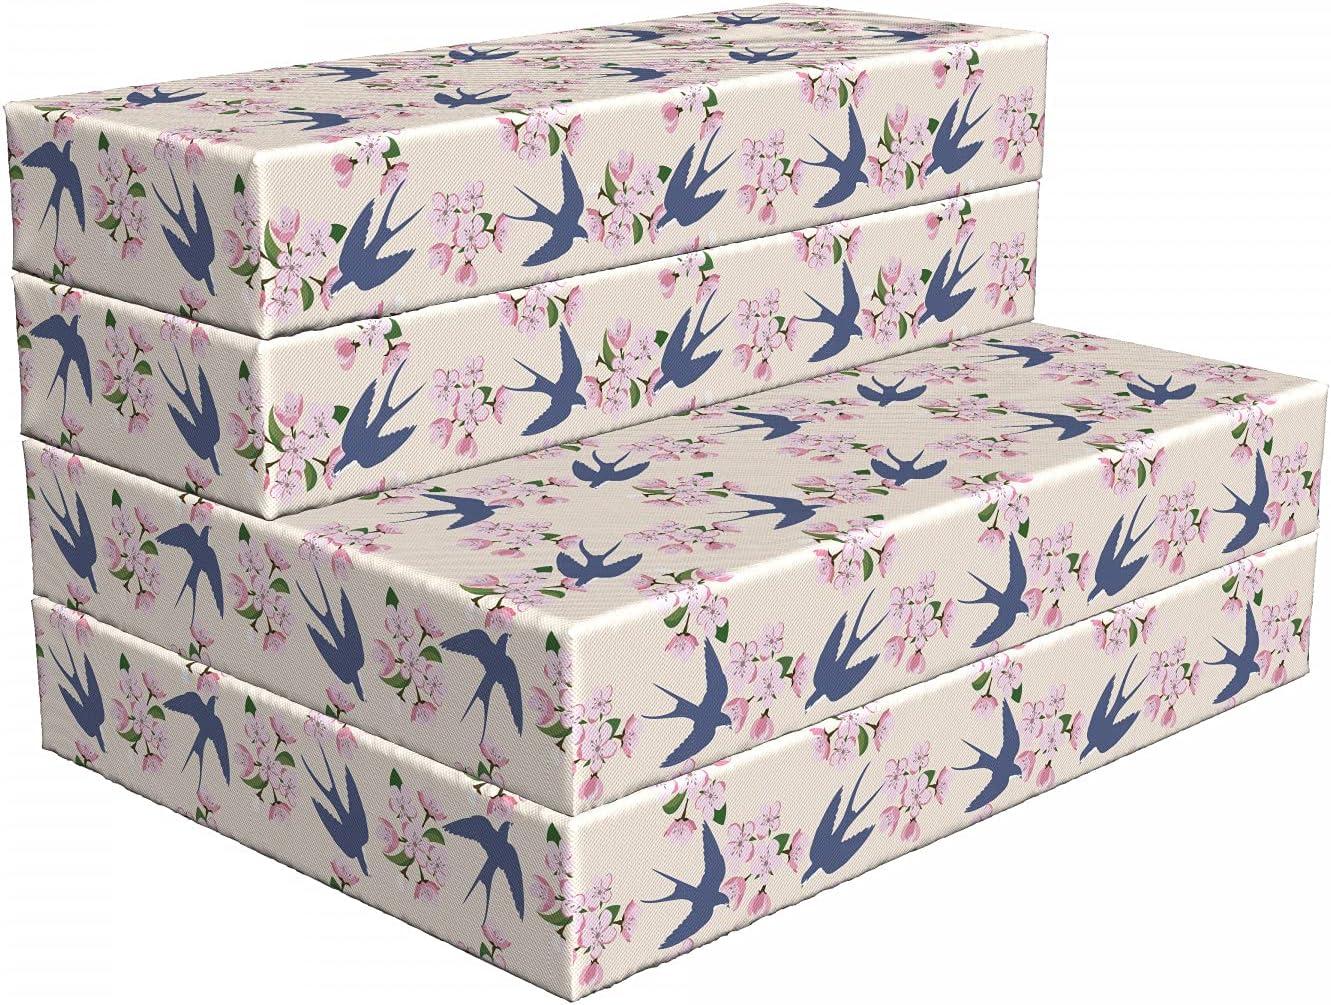 Ambesonne Romantic Louisville-Jefferson County Mall Foldable Mattress Swallow Flowers and 74.8